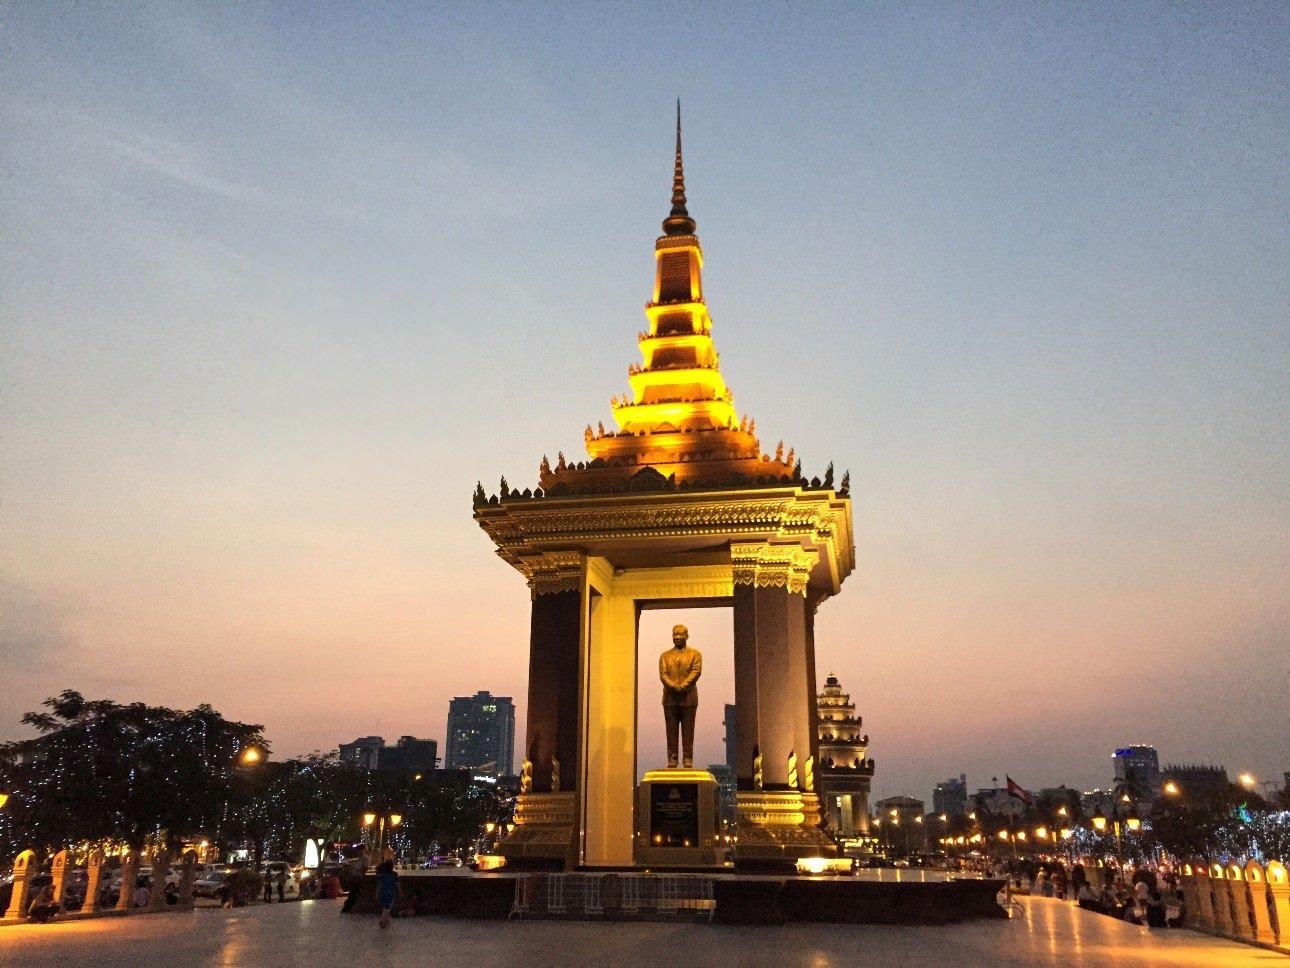 Phnom Penh Nothing But Blue Skies